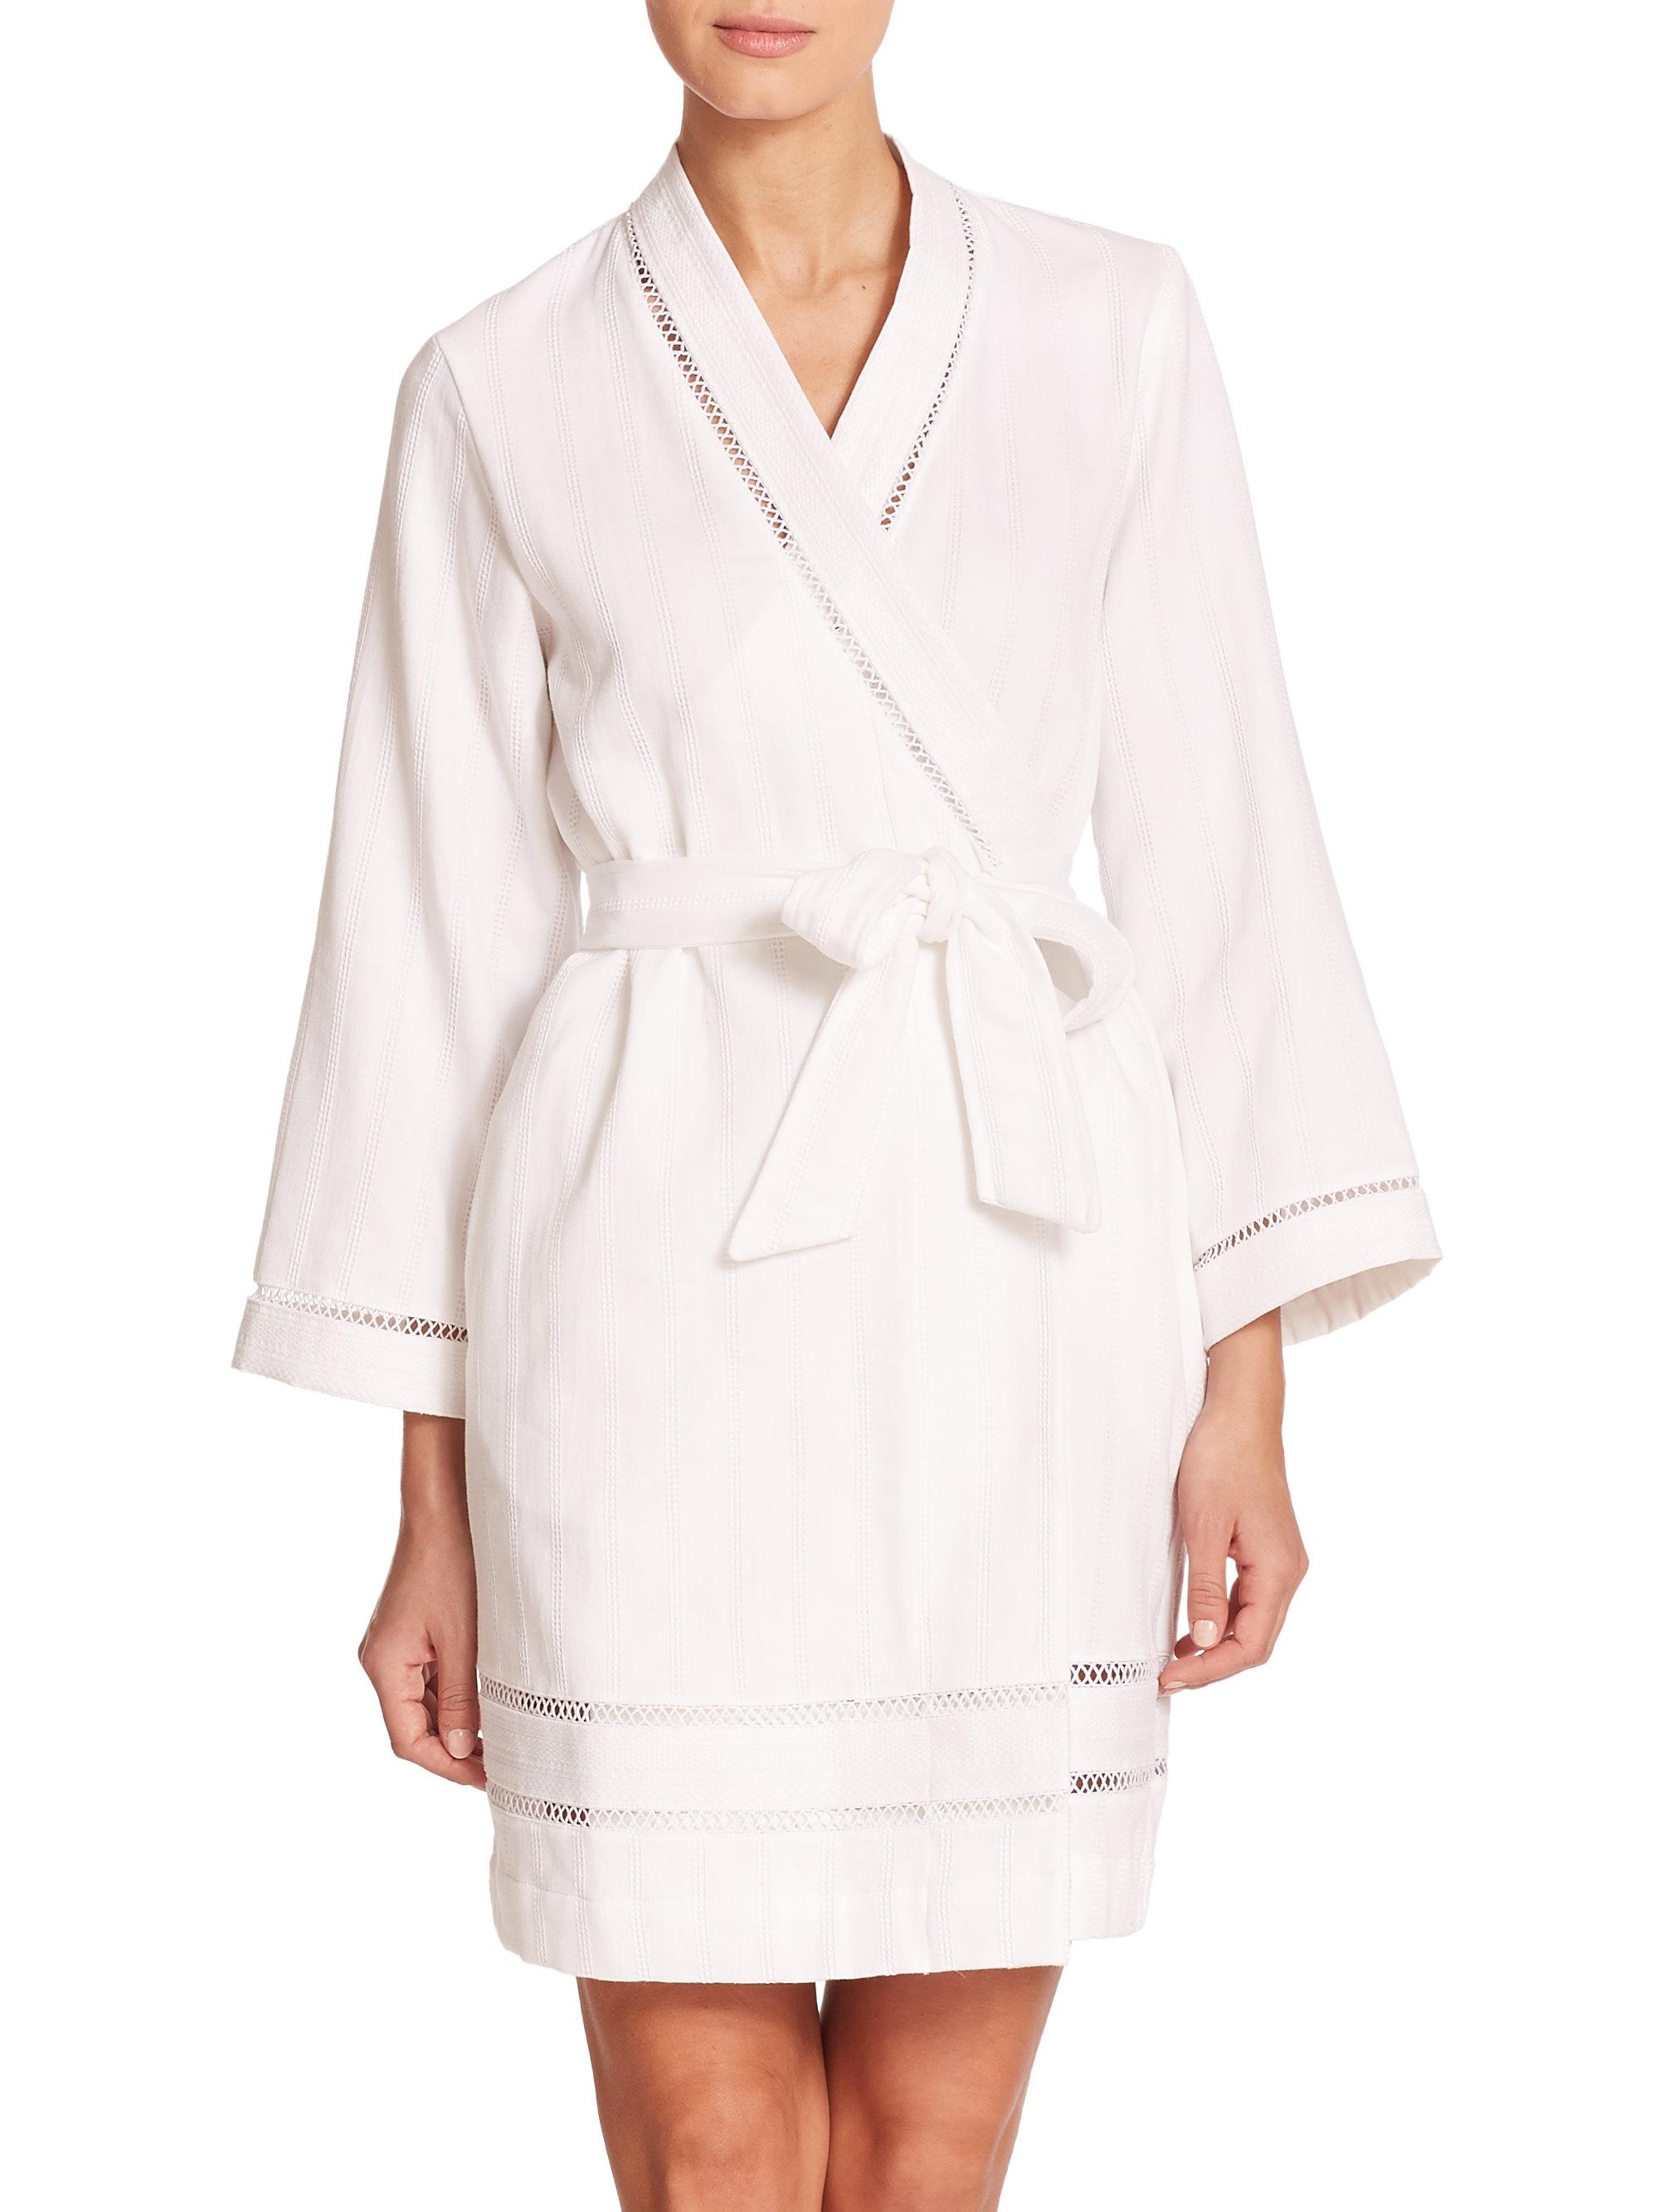 oscar de la renta luxe spa short cotton robe in white lyst. Black Bedroom Furniture Sets. Home Design Ideas